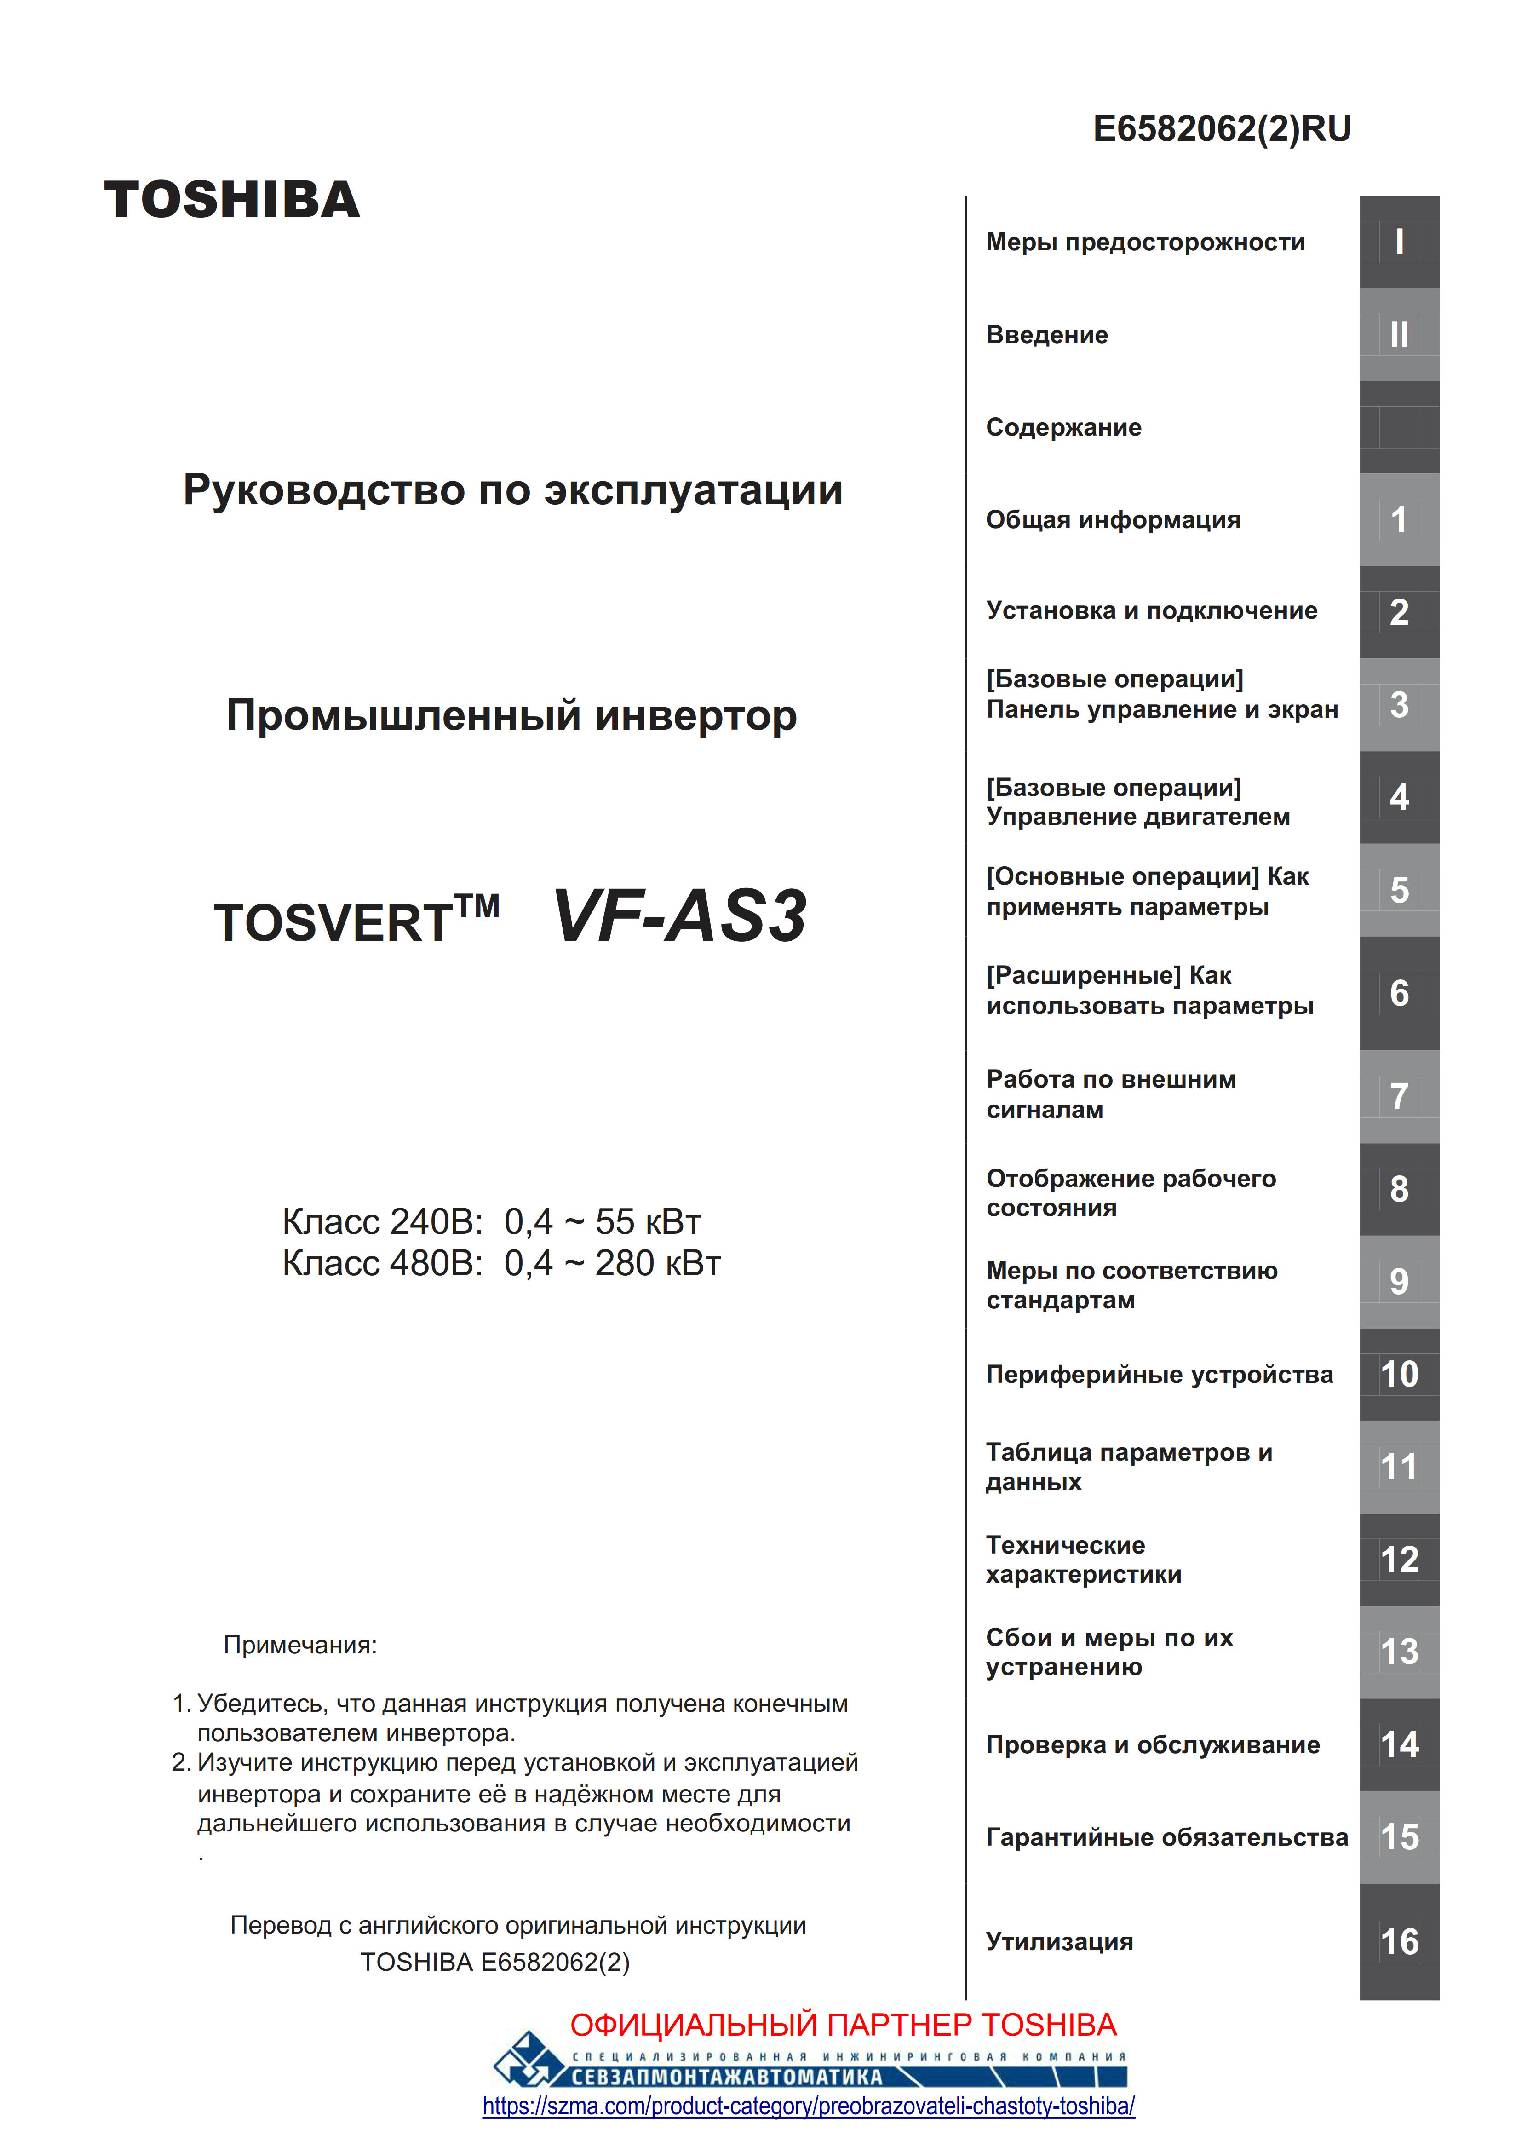 Руководство по эксплуатации частотника VF-AS3 на русском языке E6582062